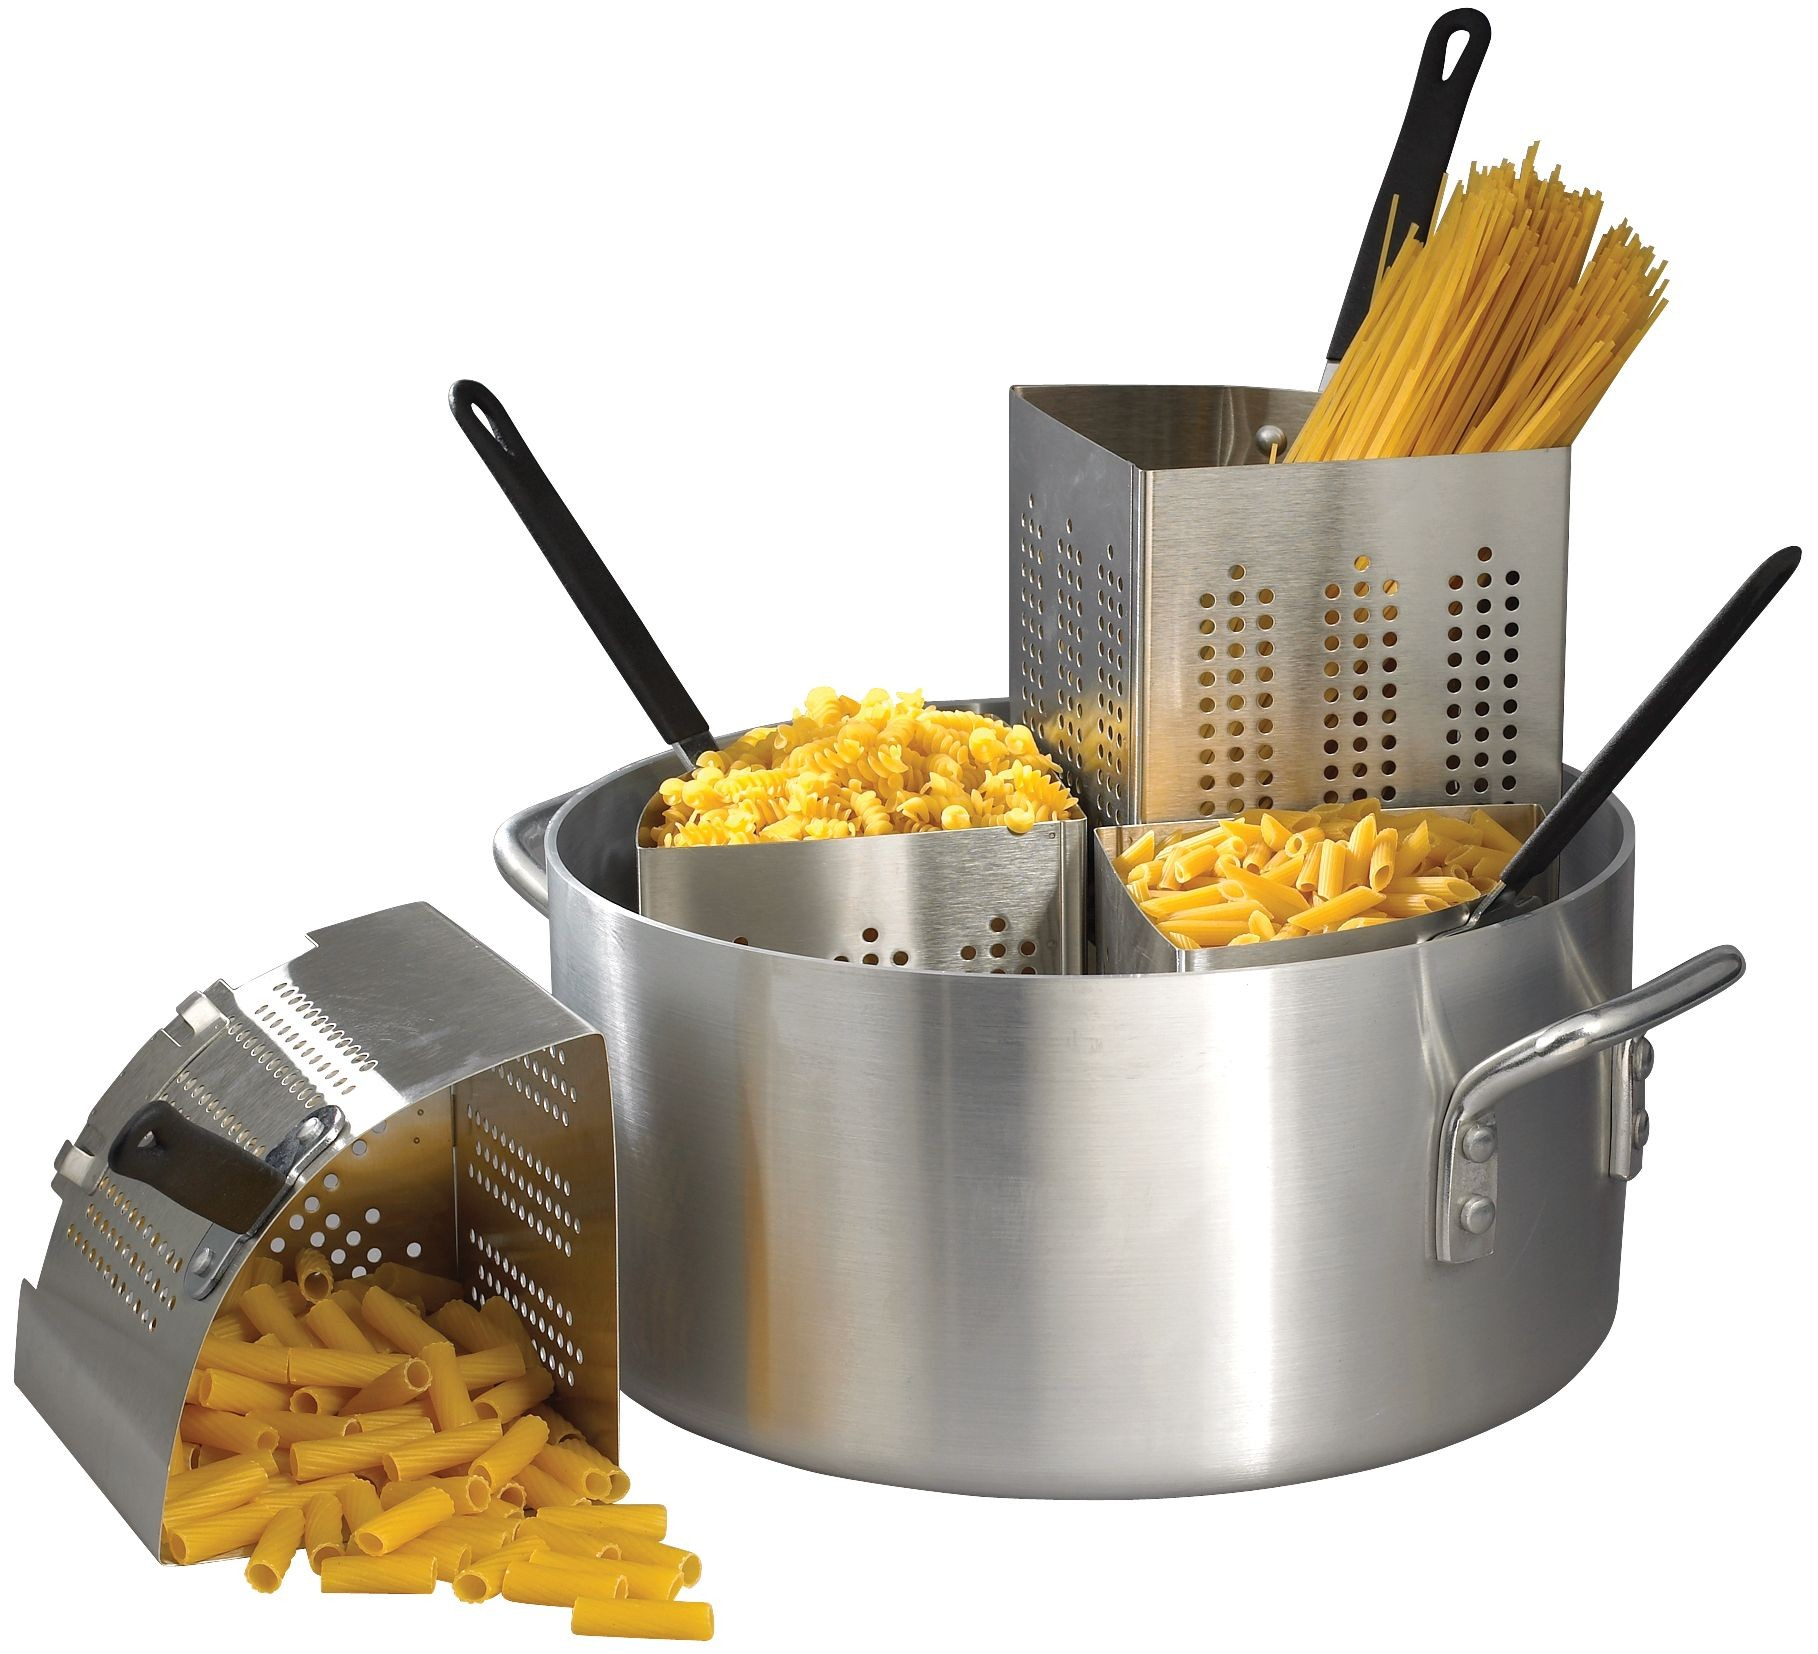 Winco APS-20 Aluminum Pasta Cooker 20 Qt.